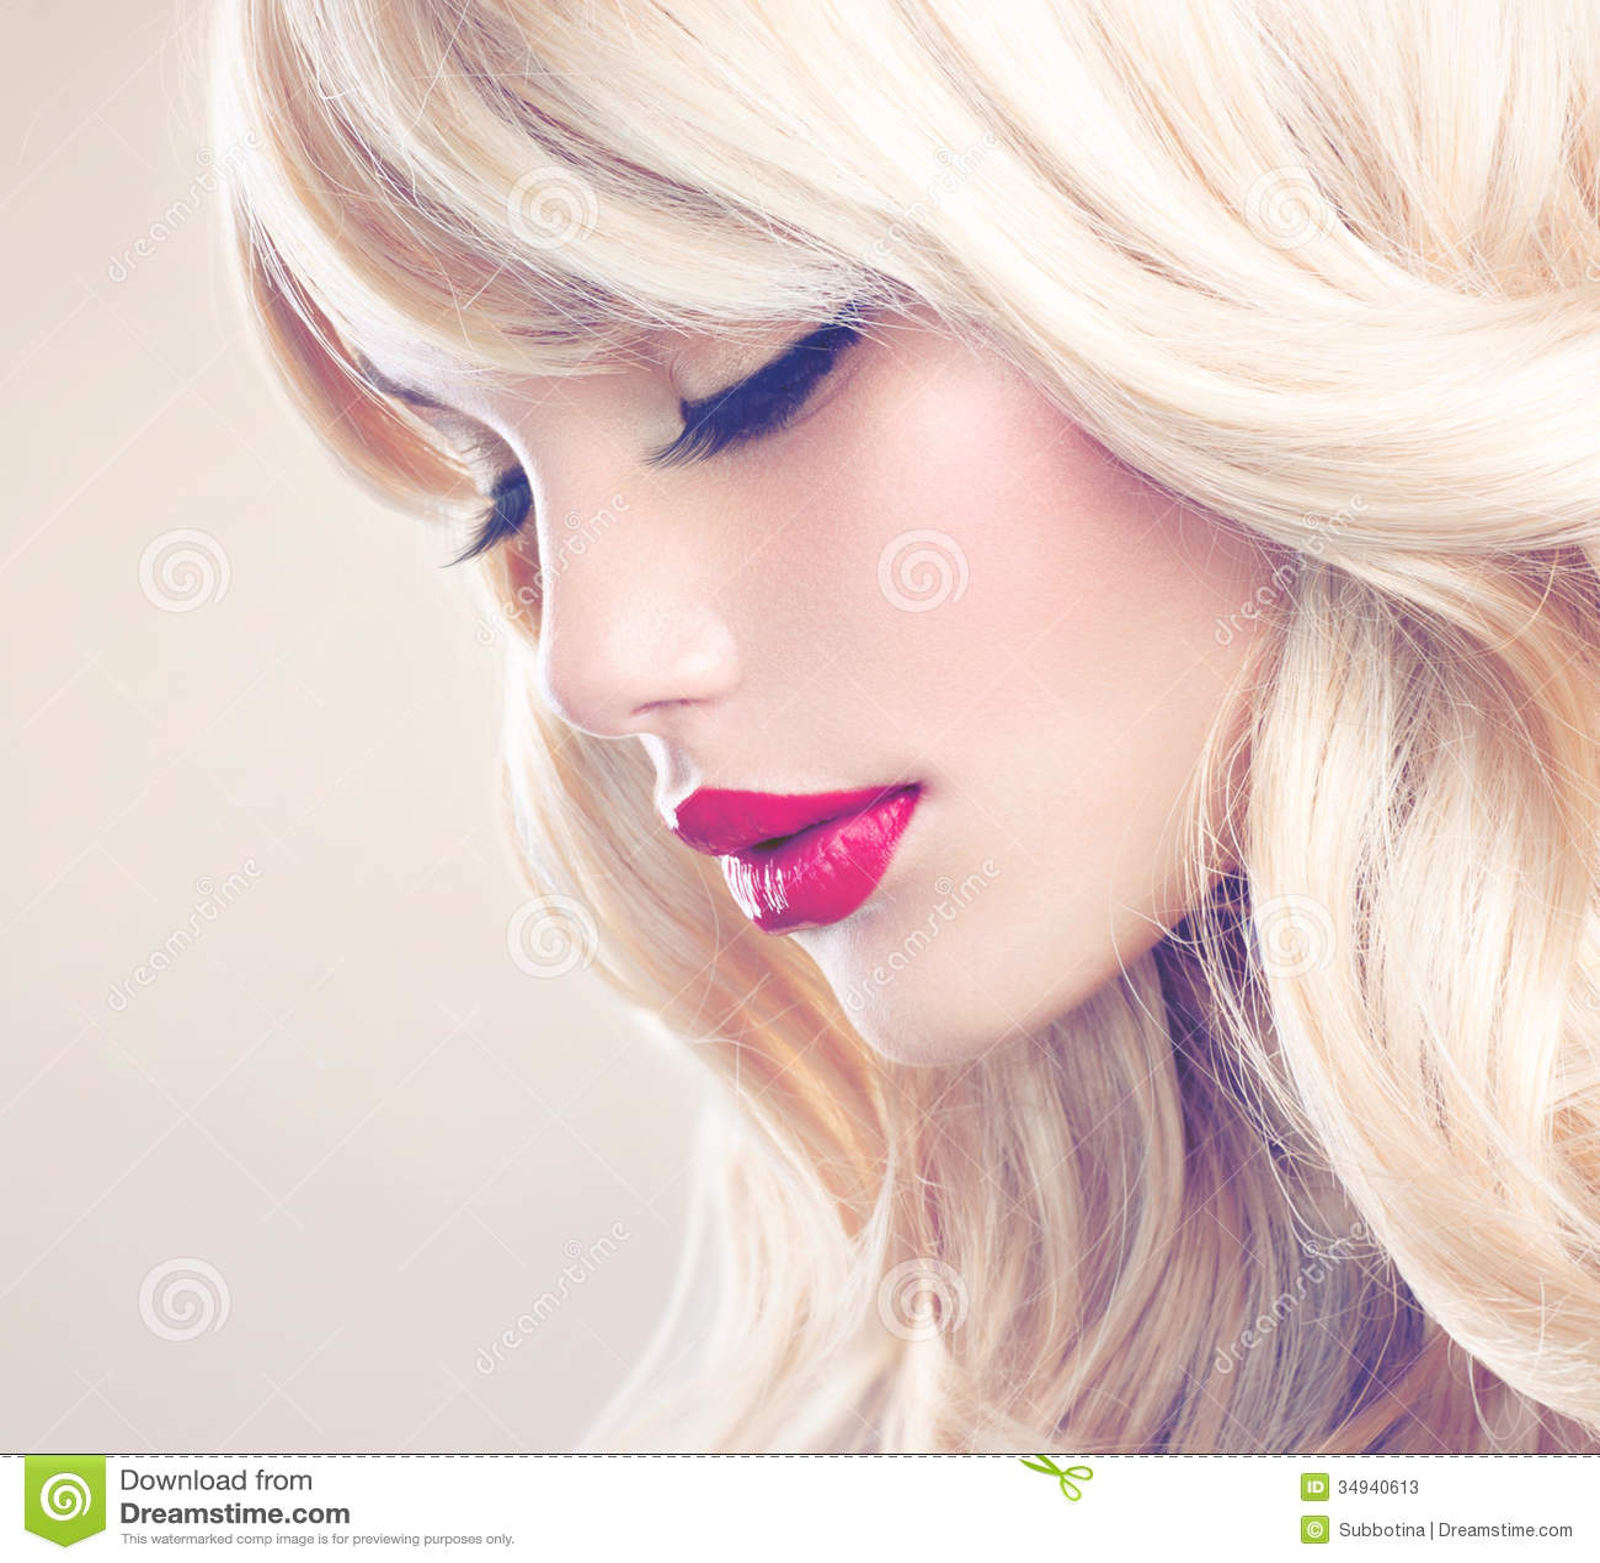 DesBellesFillescom : les plus belles filles au monde